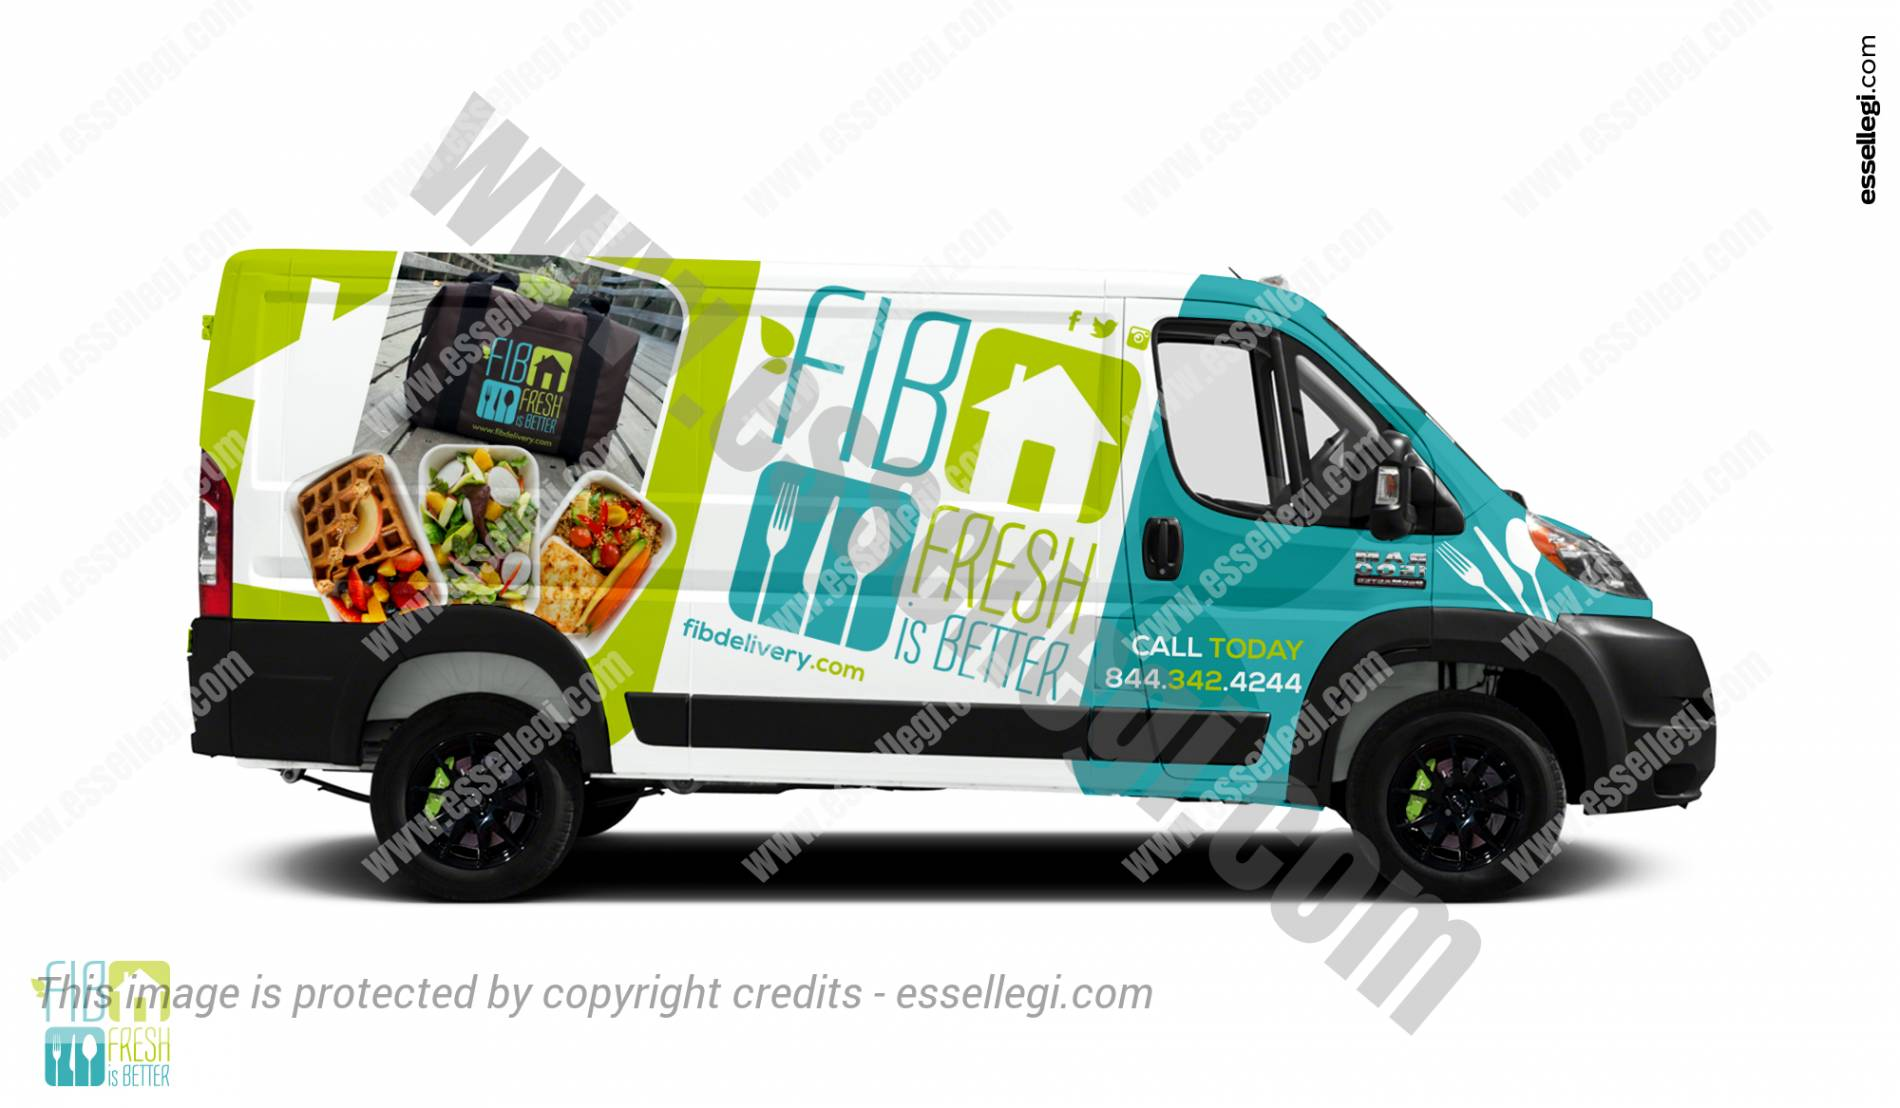 Dodge Ram ProMaster 1500 | Van Wrap Design by Essellegi. Van Signs, Van Signage, Van Wrapping, Van Signwriting, Van Wrap Designer, Signs for Van, Van Logo by Essellegi.